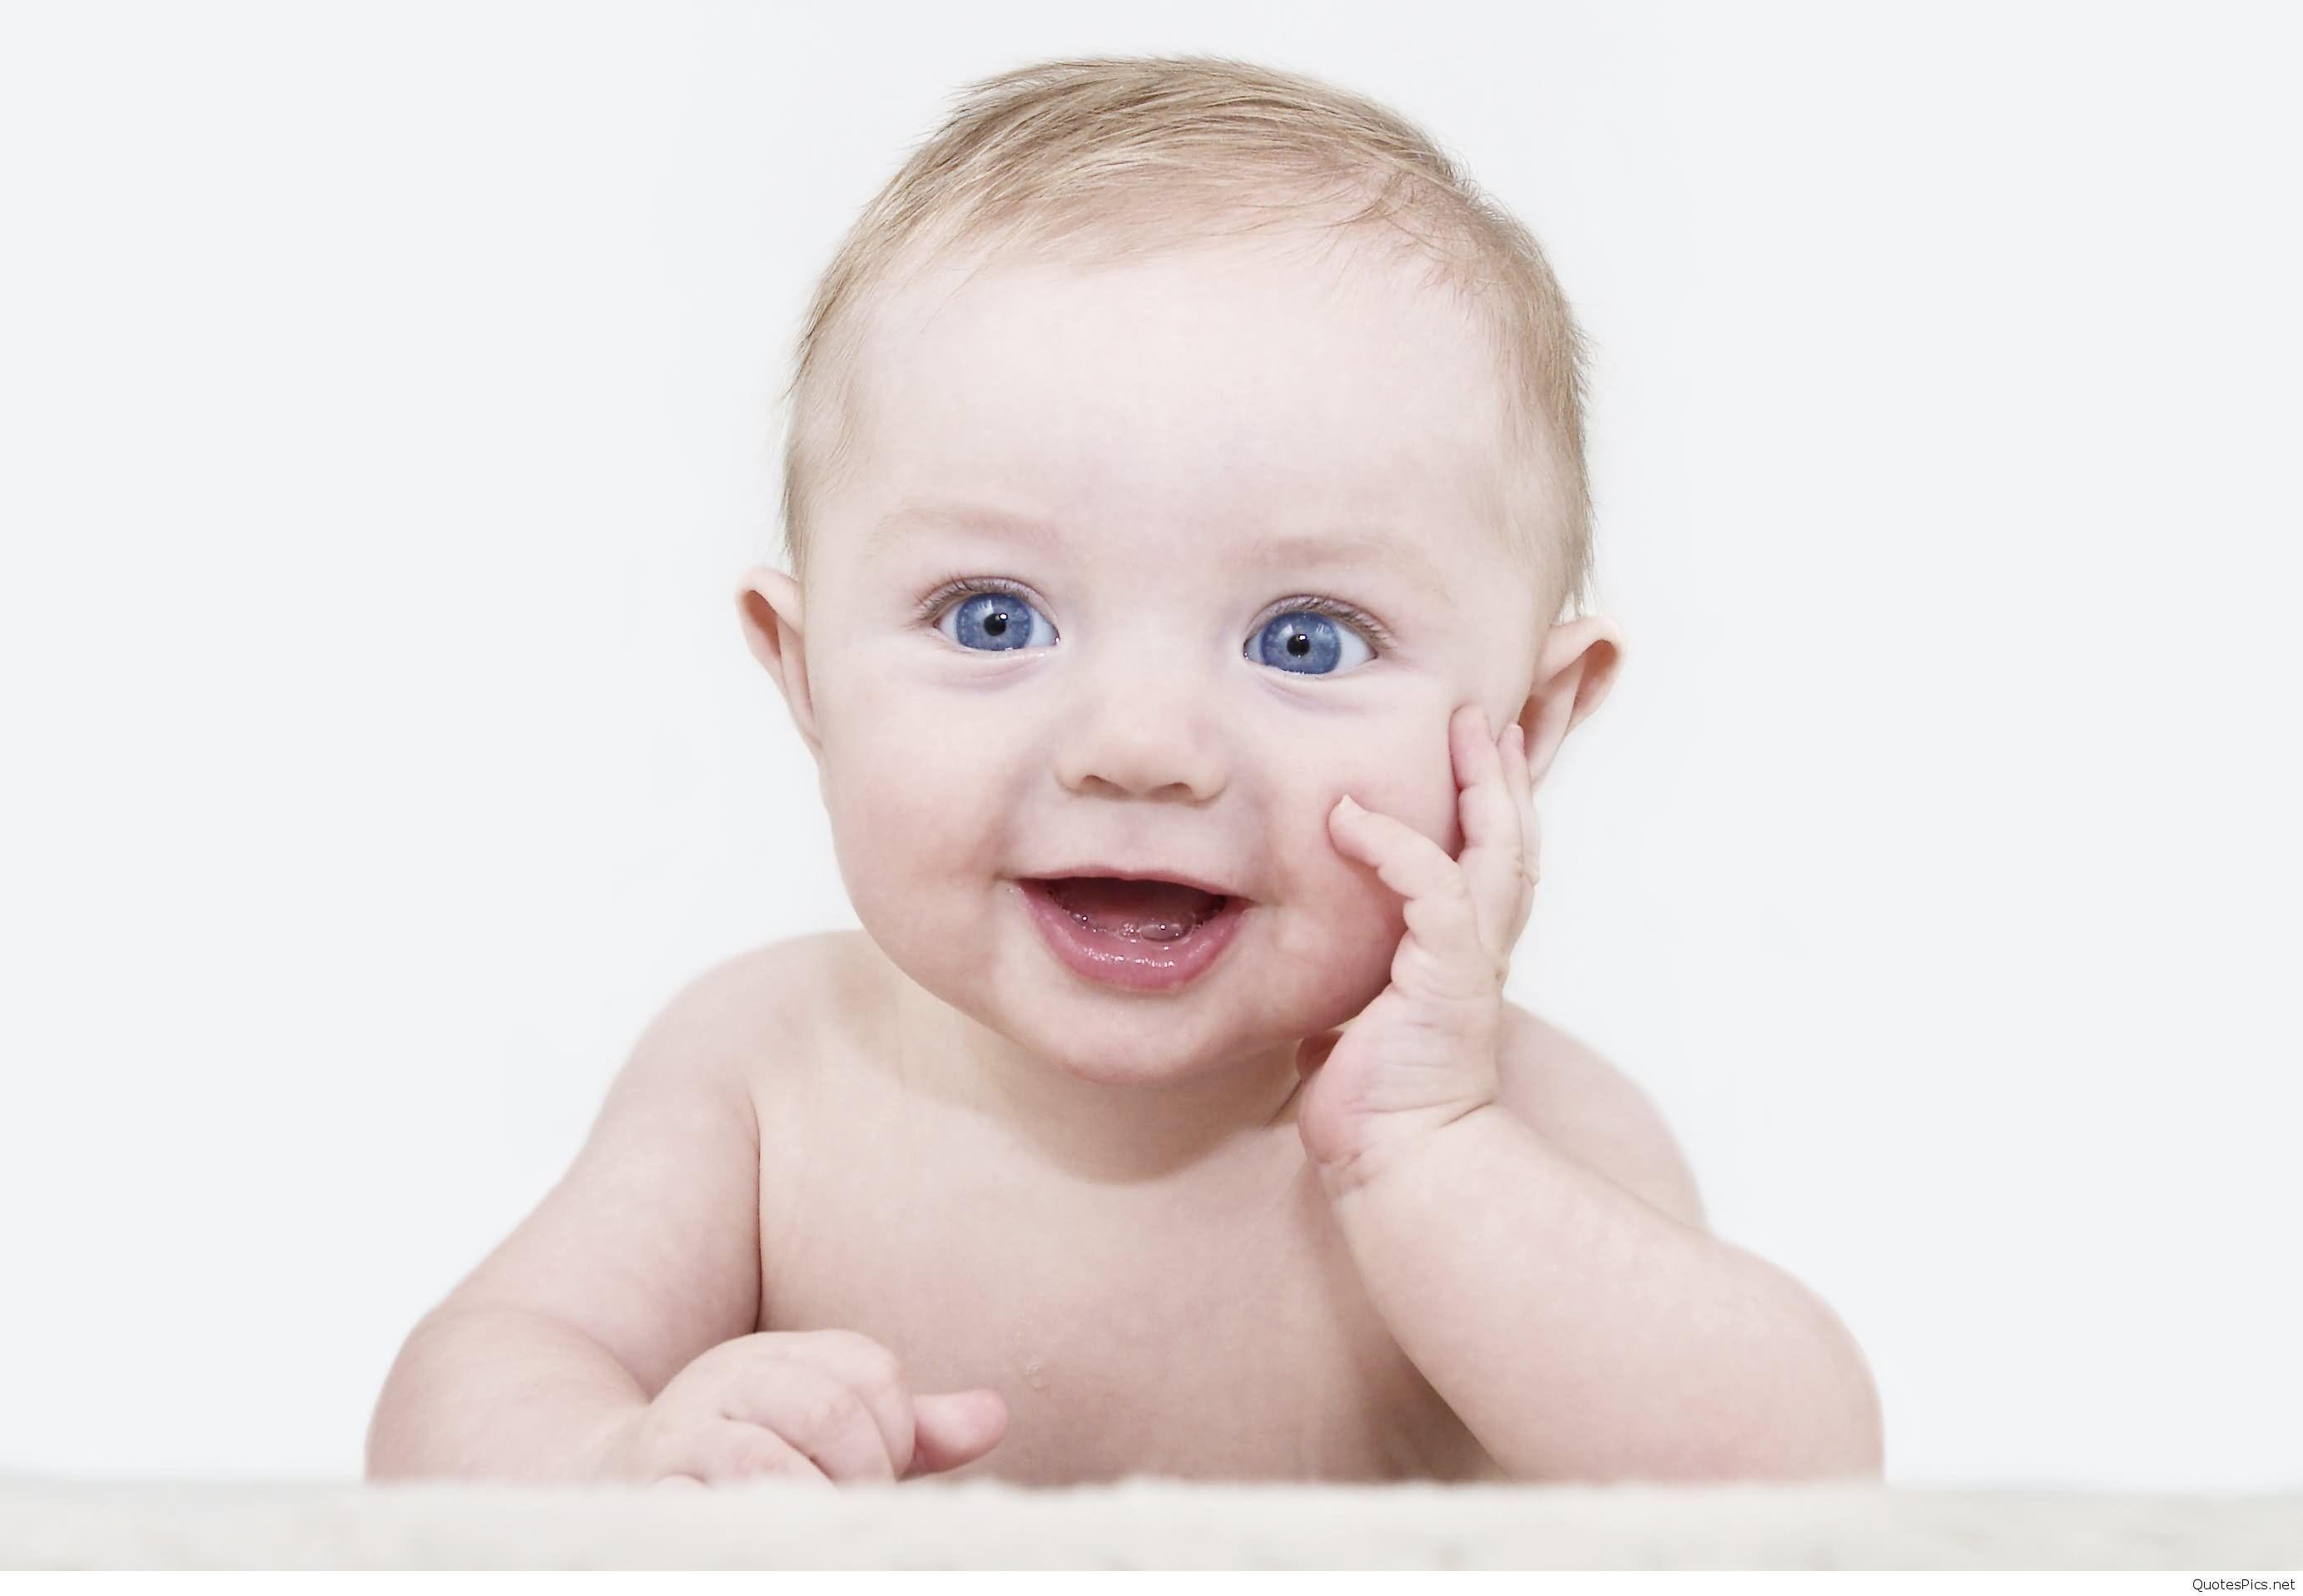 Cute Baby Wallpaper Hd 2767x1918 Download Hd Wallpaper Wallpapertip